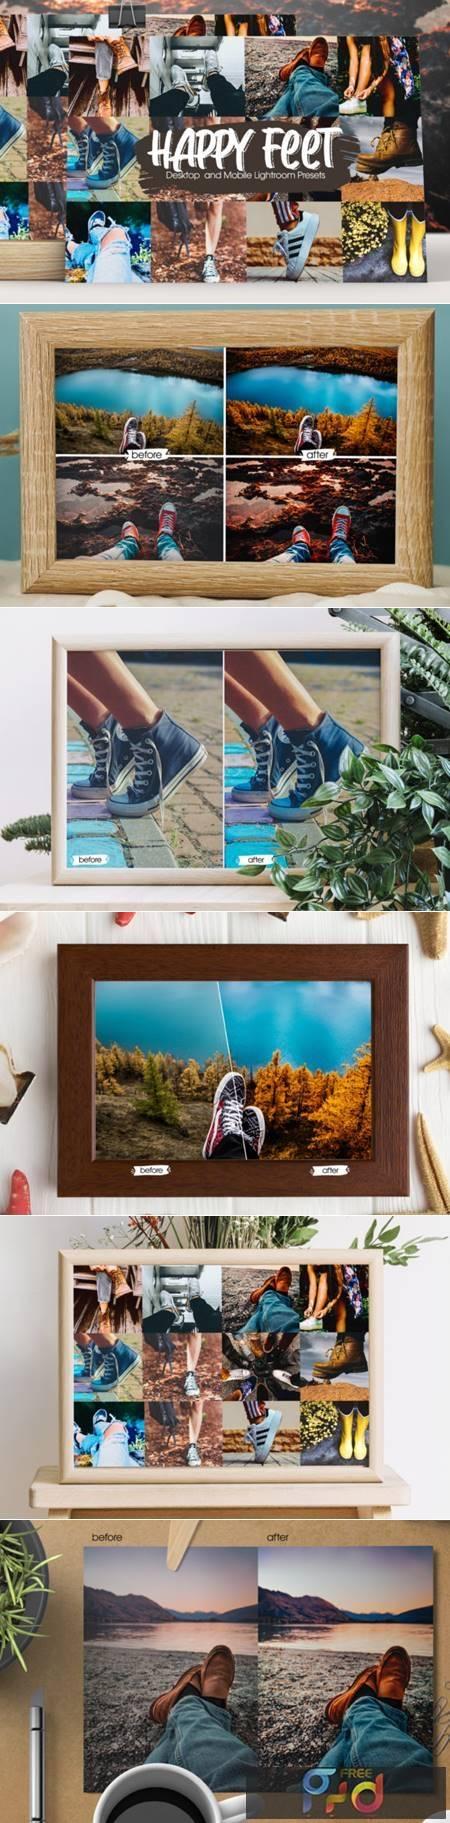 Happy Feet Lightroom Presets 5883699 1